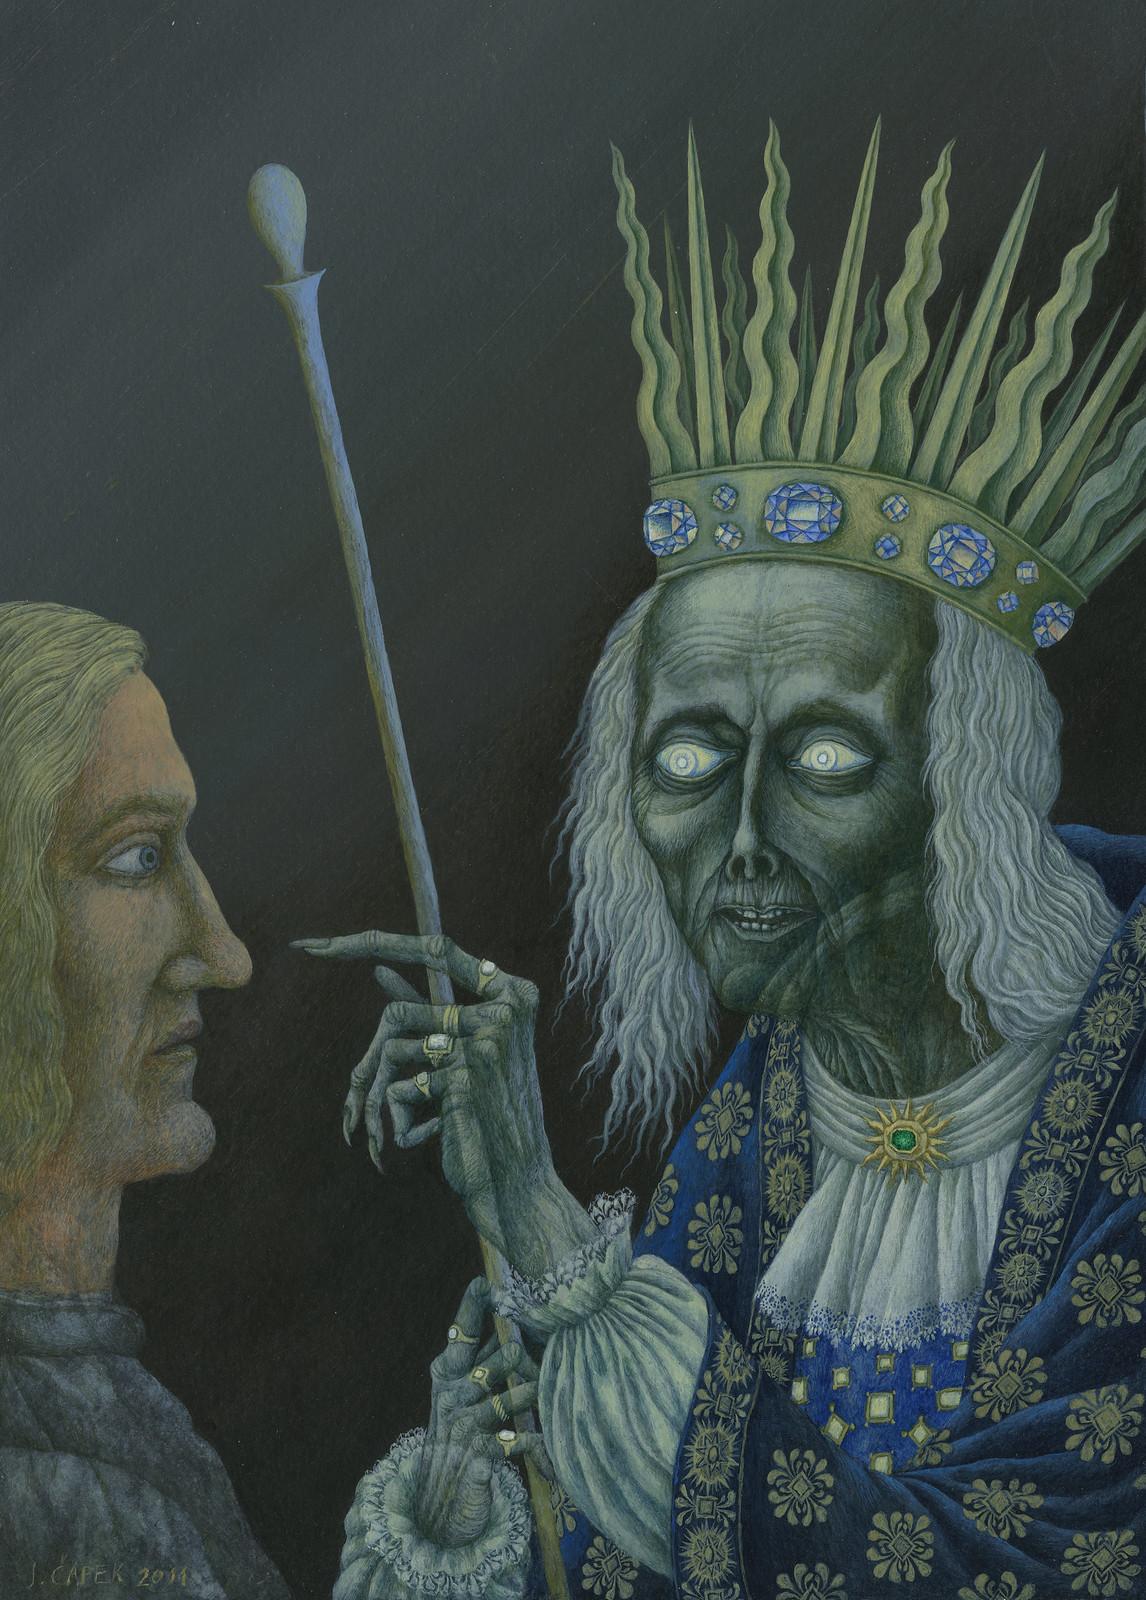 Jindra Capek - The Kingdom of Mighty Villas, Illustration 2